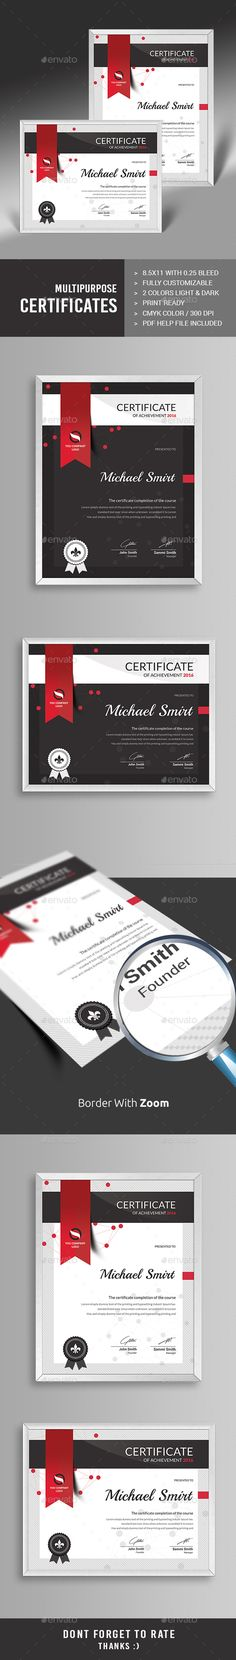 Multipurpose Certificates - Certificates Stationery                                                                                                                                                     More